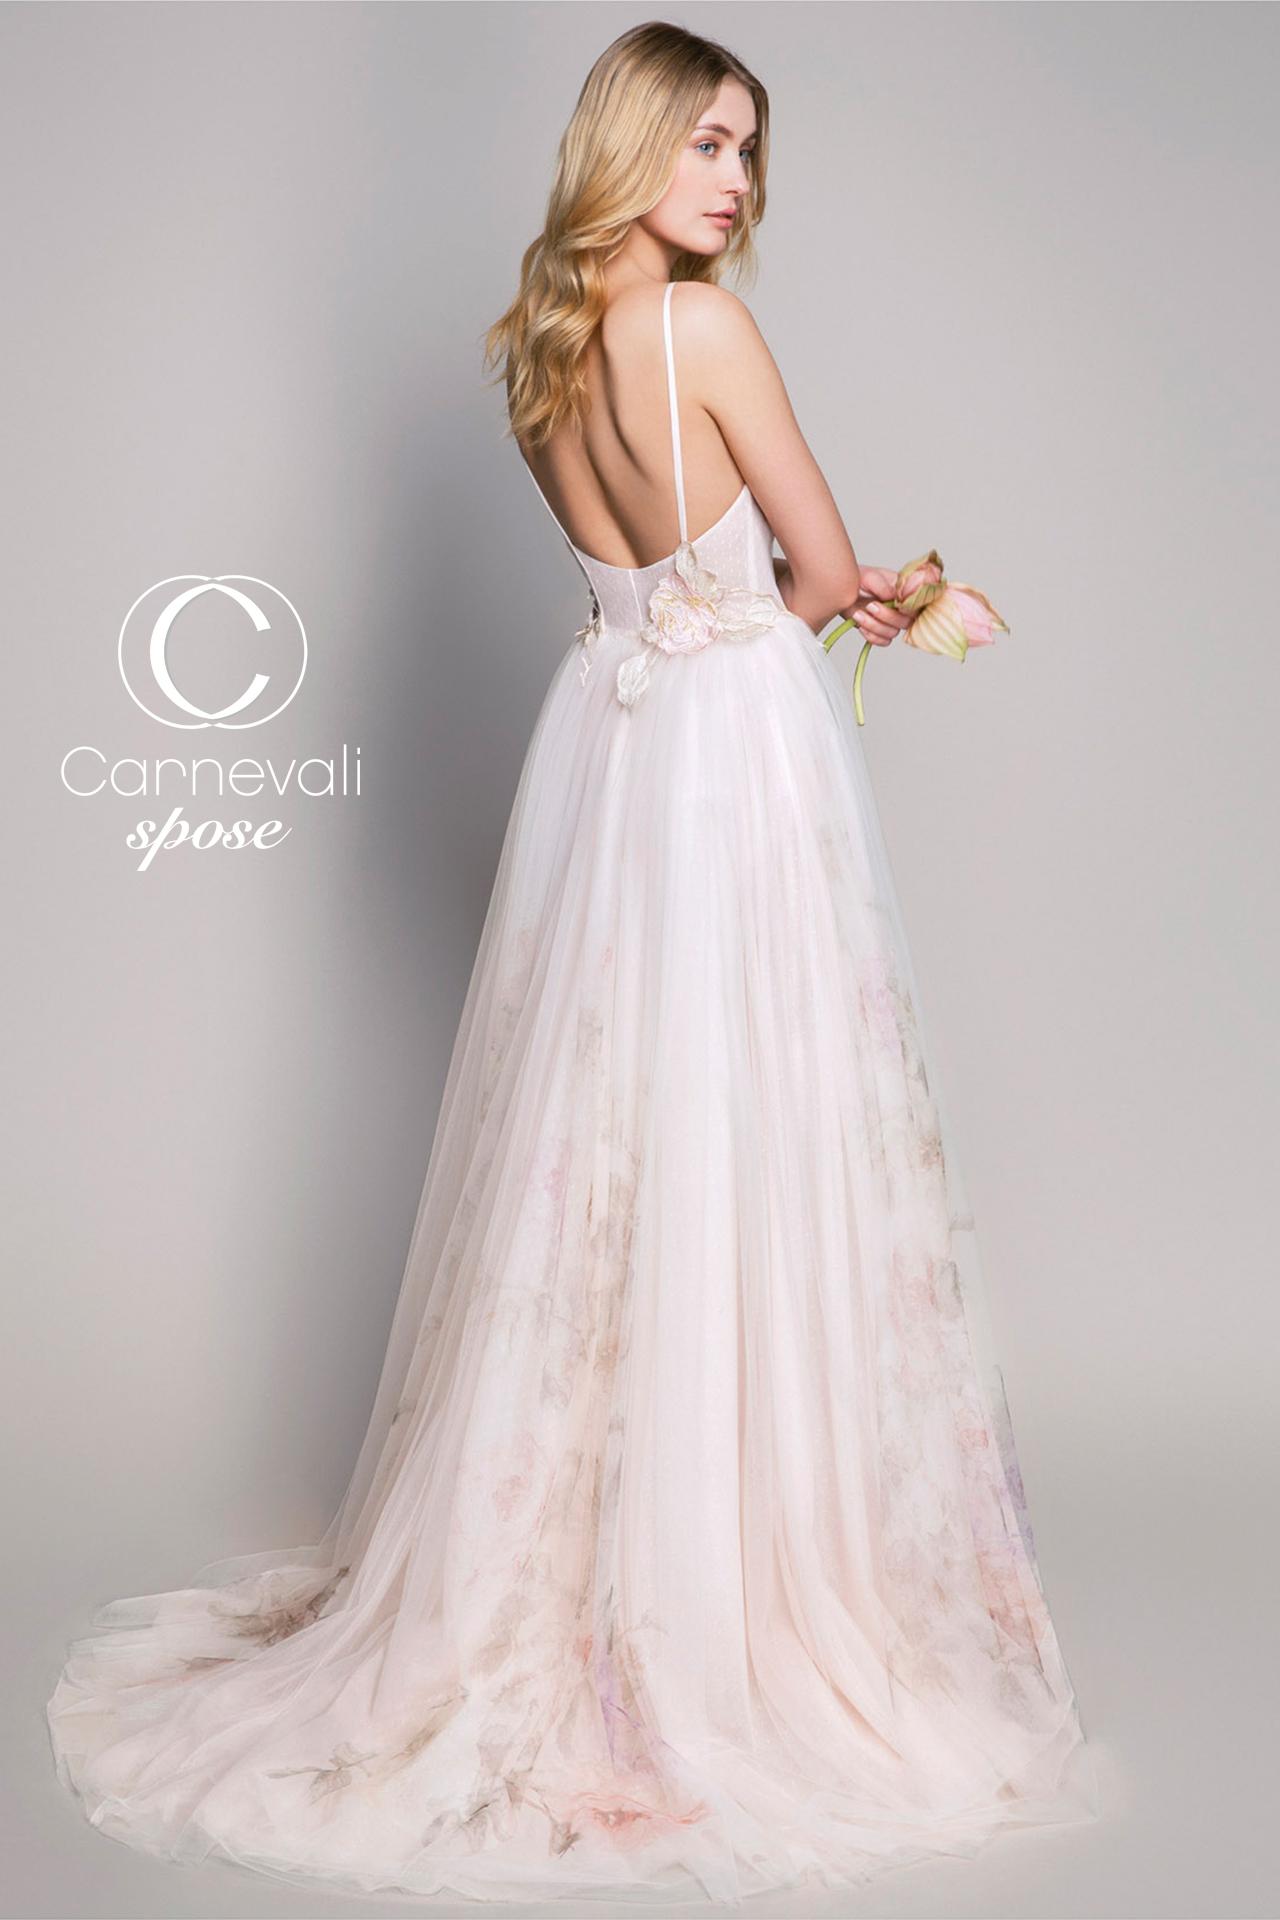 a031a70f3e03 BLUMARINE 6749 - Carnevali Spose